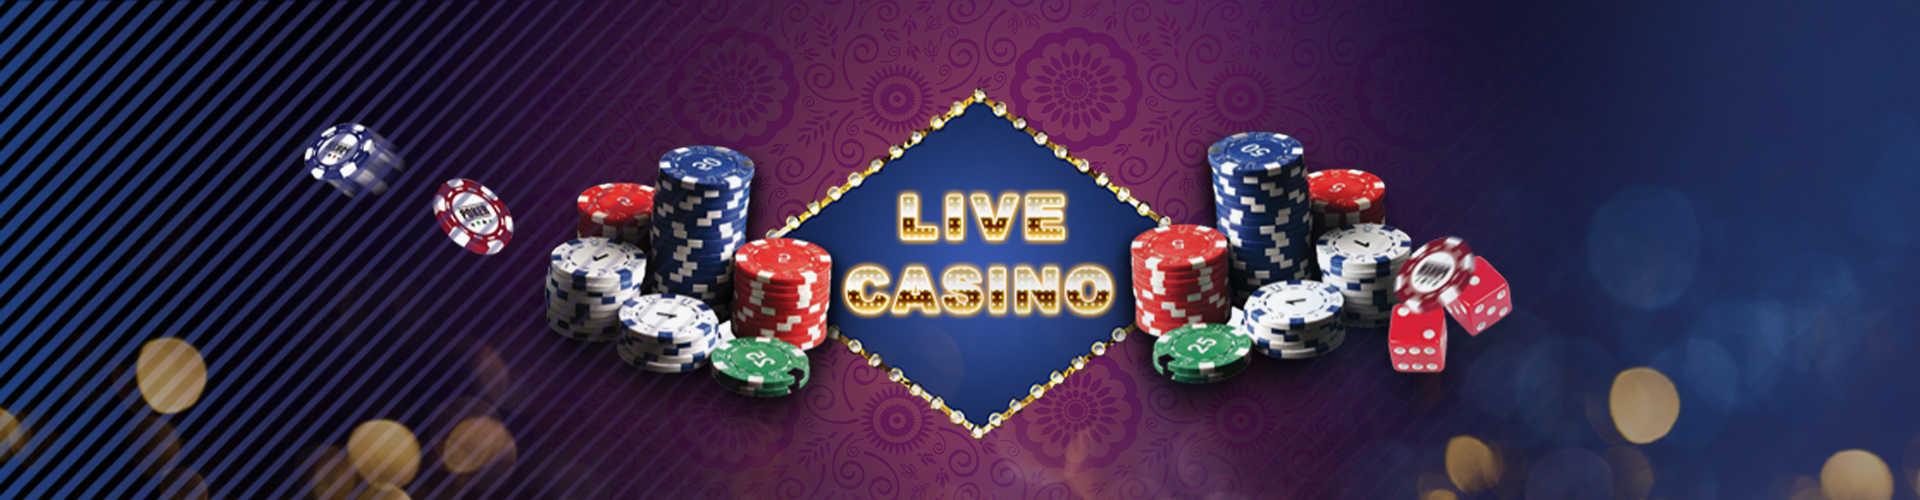 Great Online Casino Games at UWin33